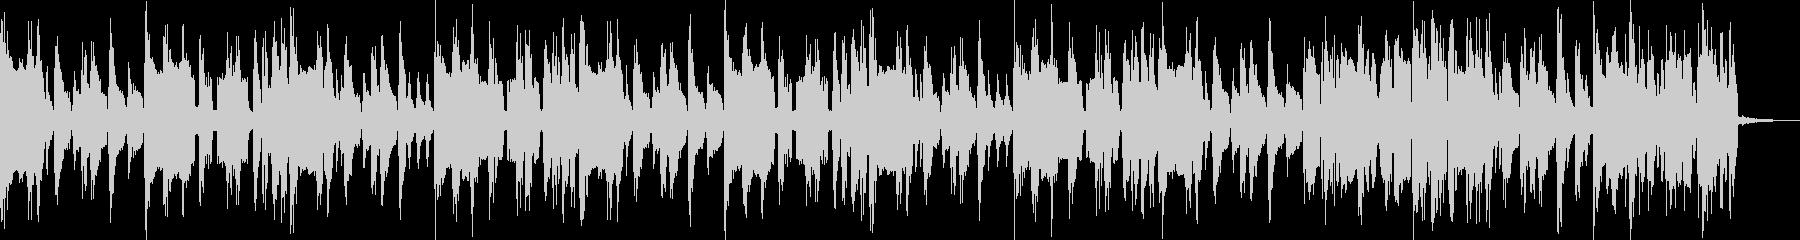 EDMドロップオンリー 08の未再生の波形